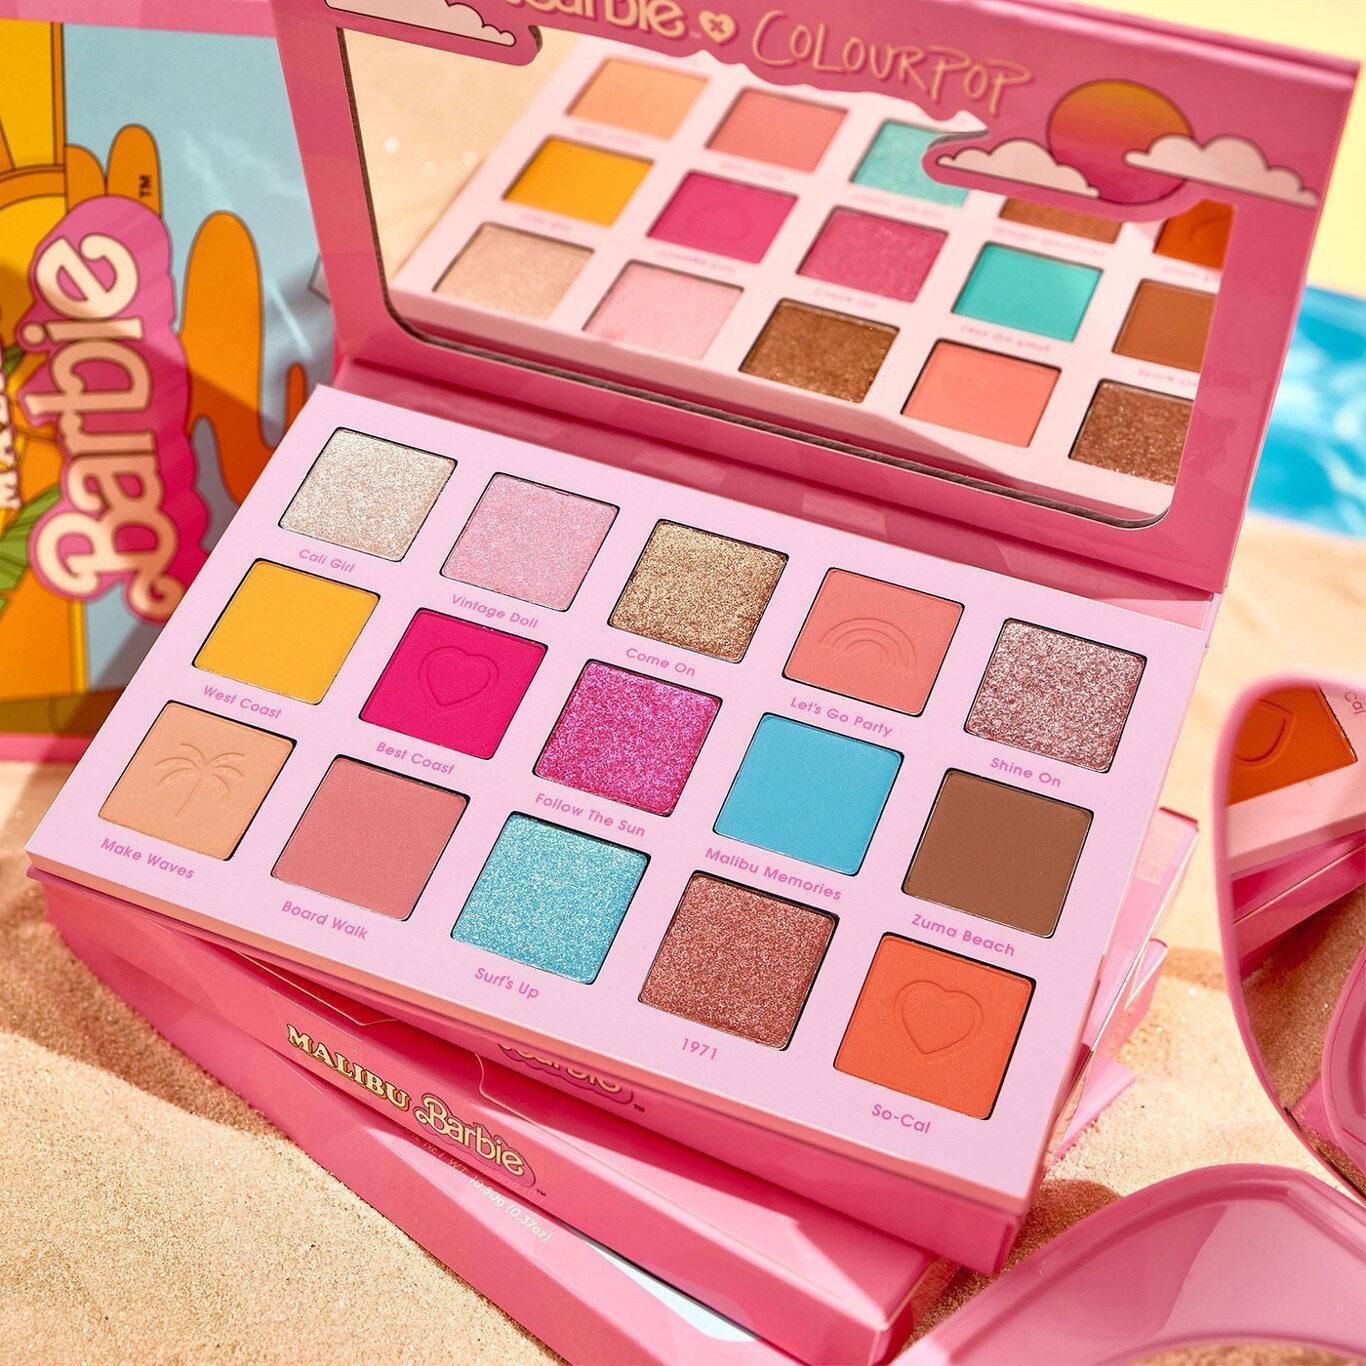 ColourPop x Malibu Barbie Eyeshadow Palette Promo